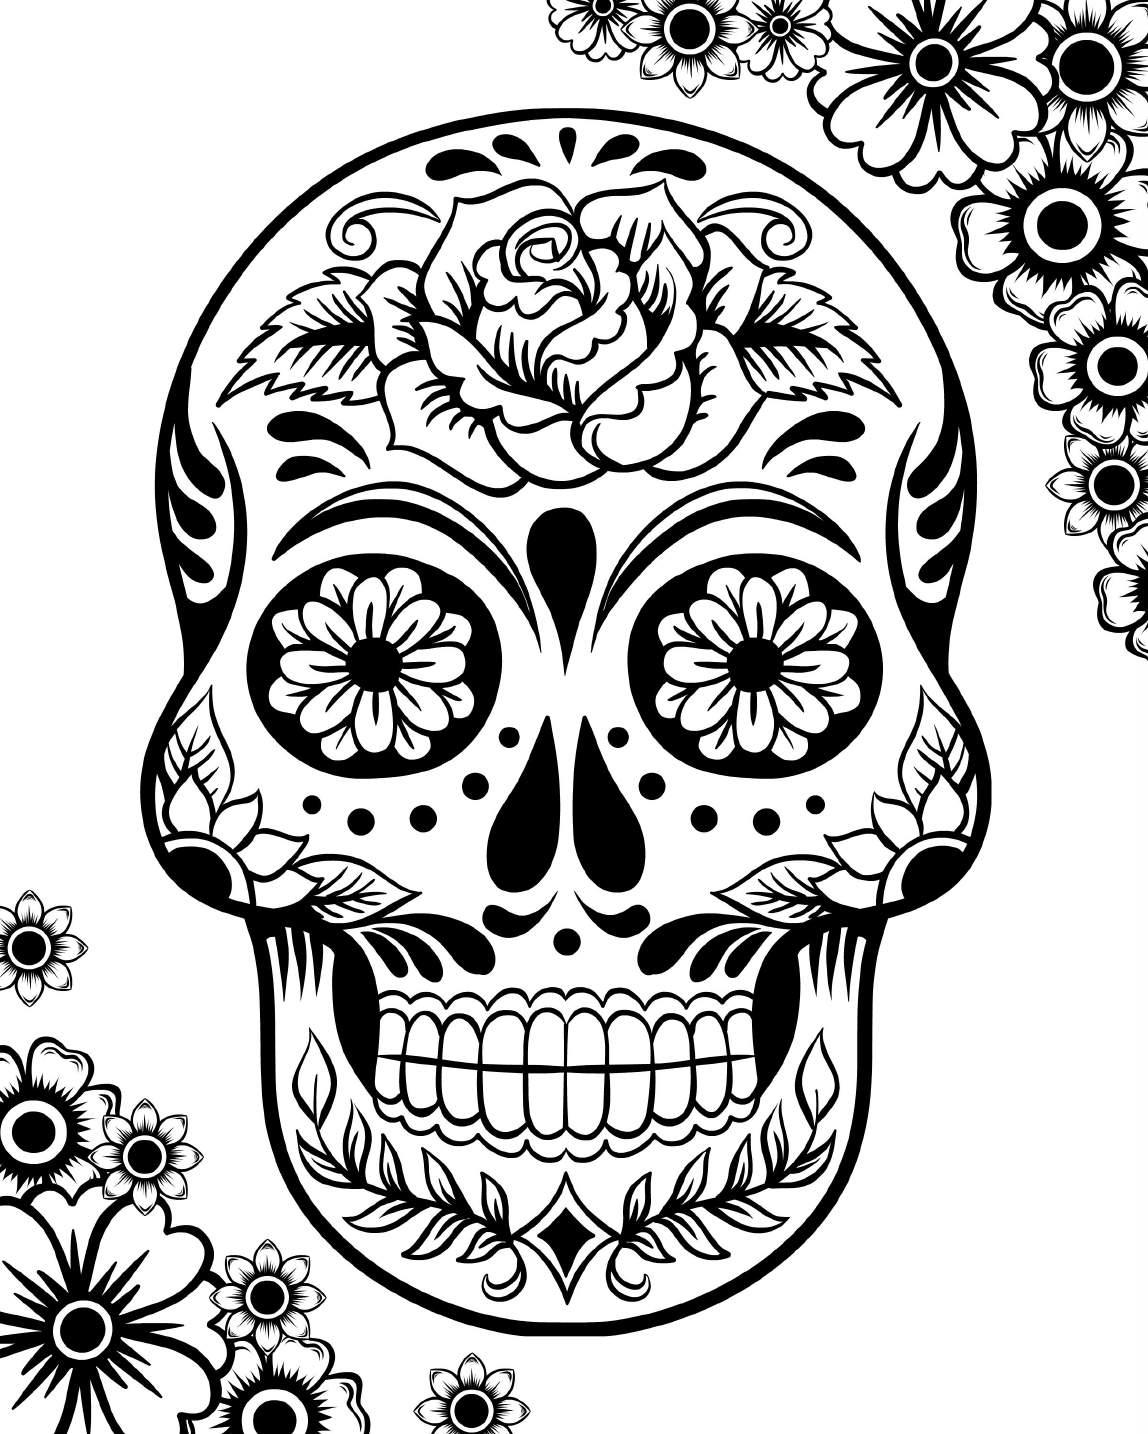 colorful sugar skull skull background images stock photos vectors shutterstock sugar skull colorful